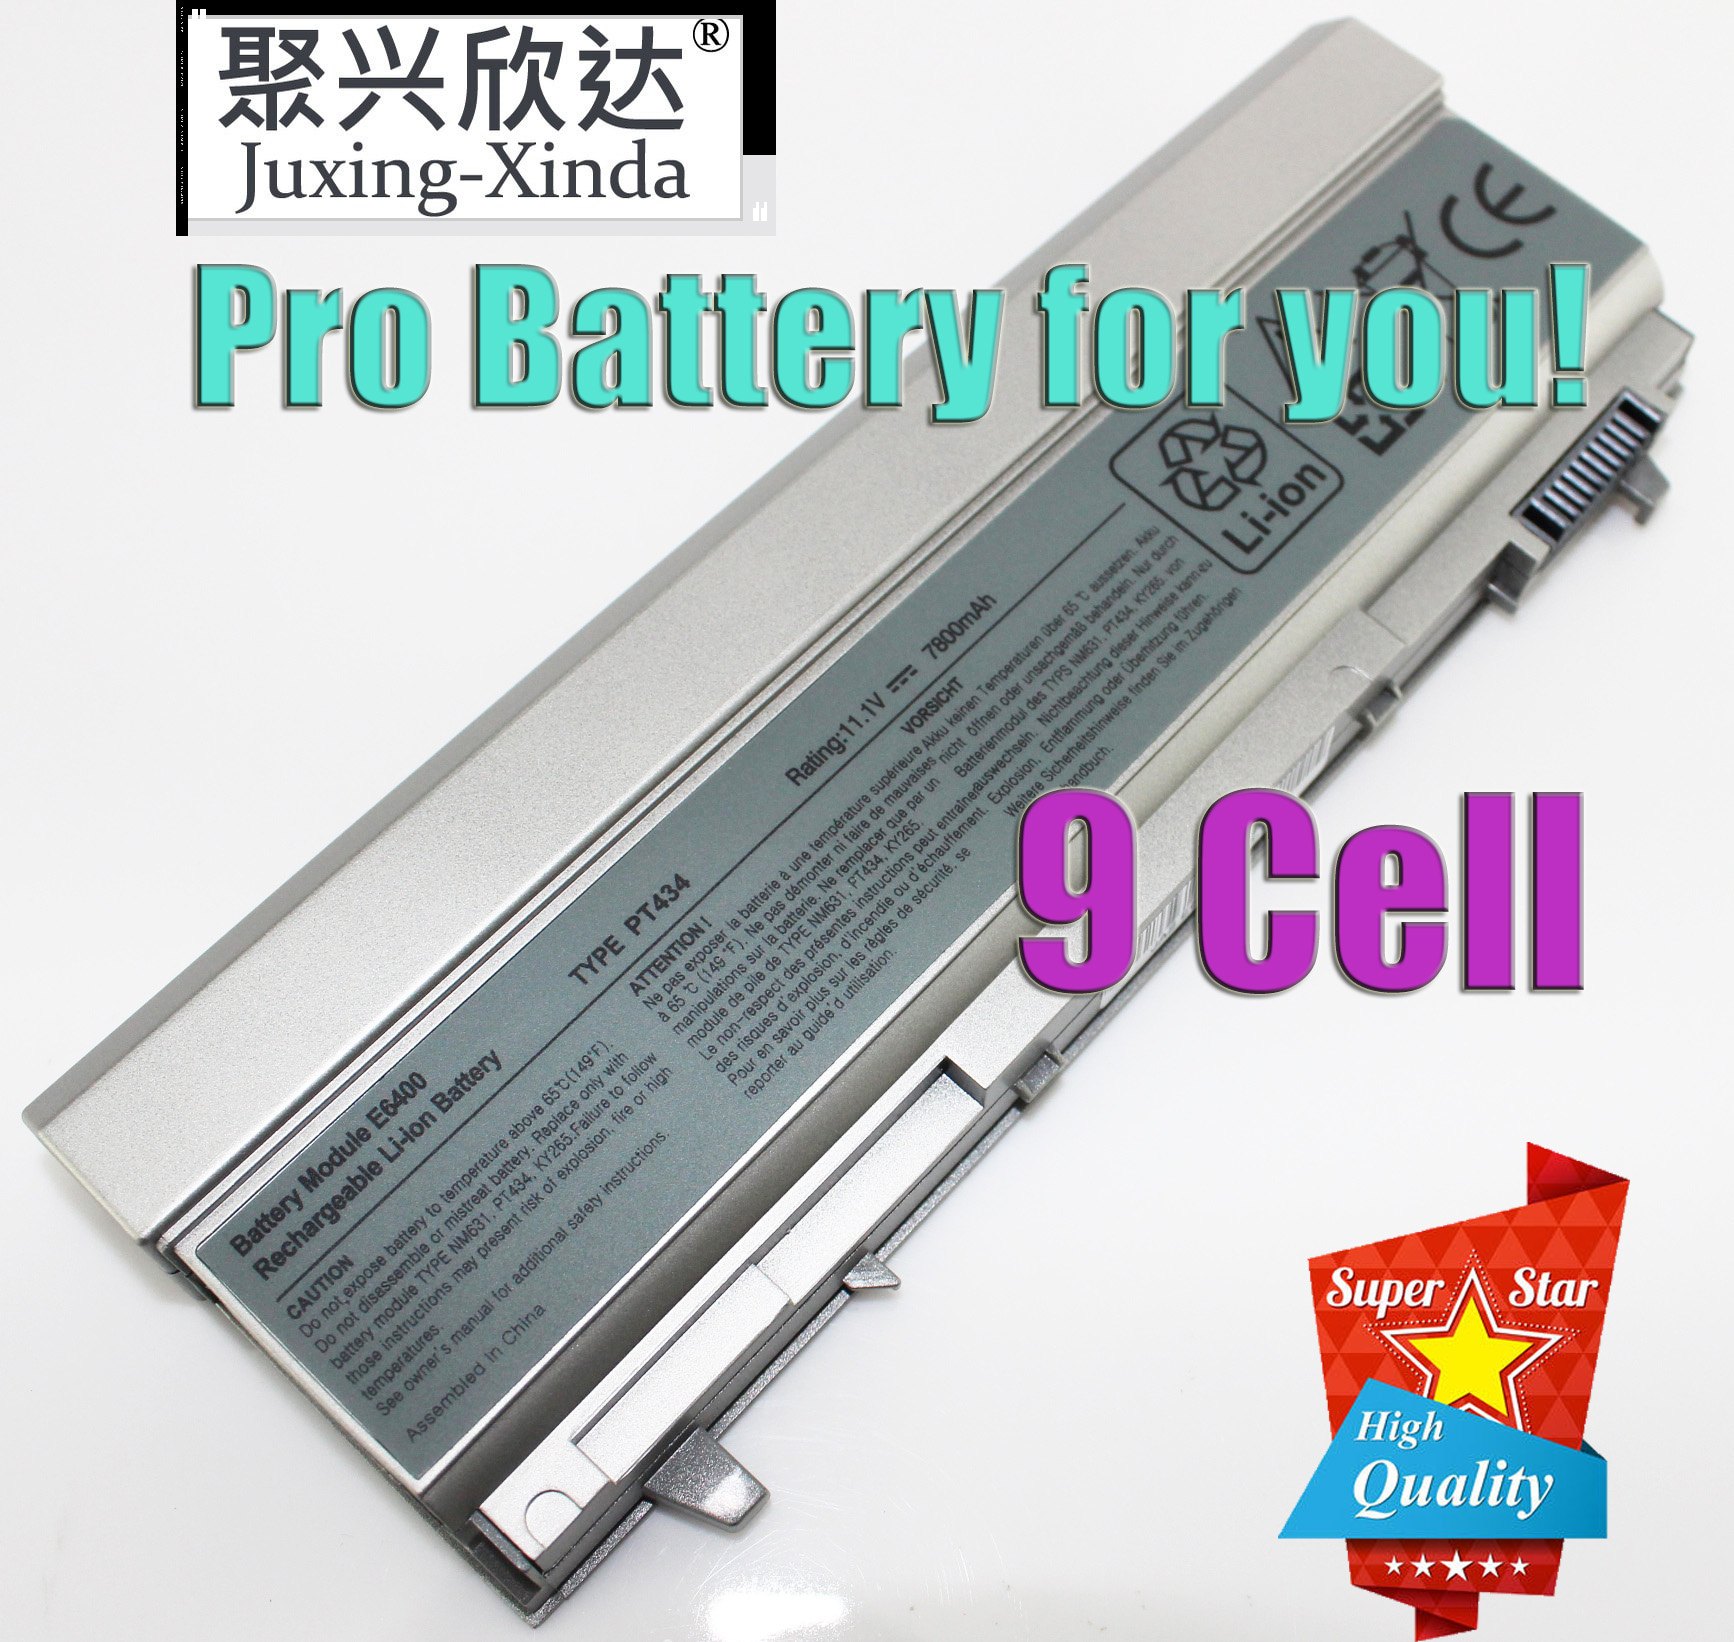 Аккумулятор для ноутбука Dell Latitude E6400 E6410 E6500 E6510 KY477 PT434 W1193 U844G 312-0748 312-0754 0917-451 FU268